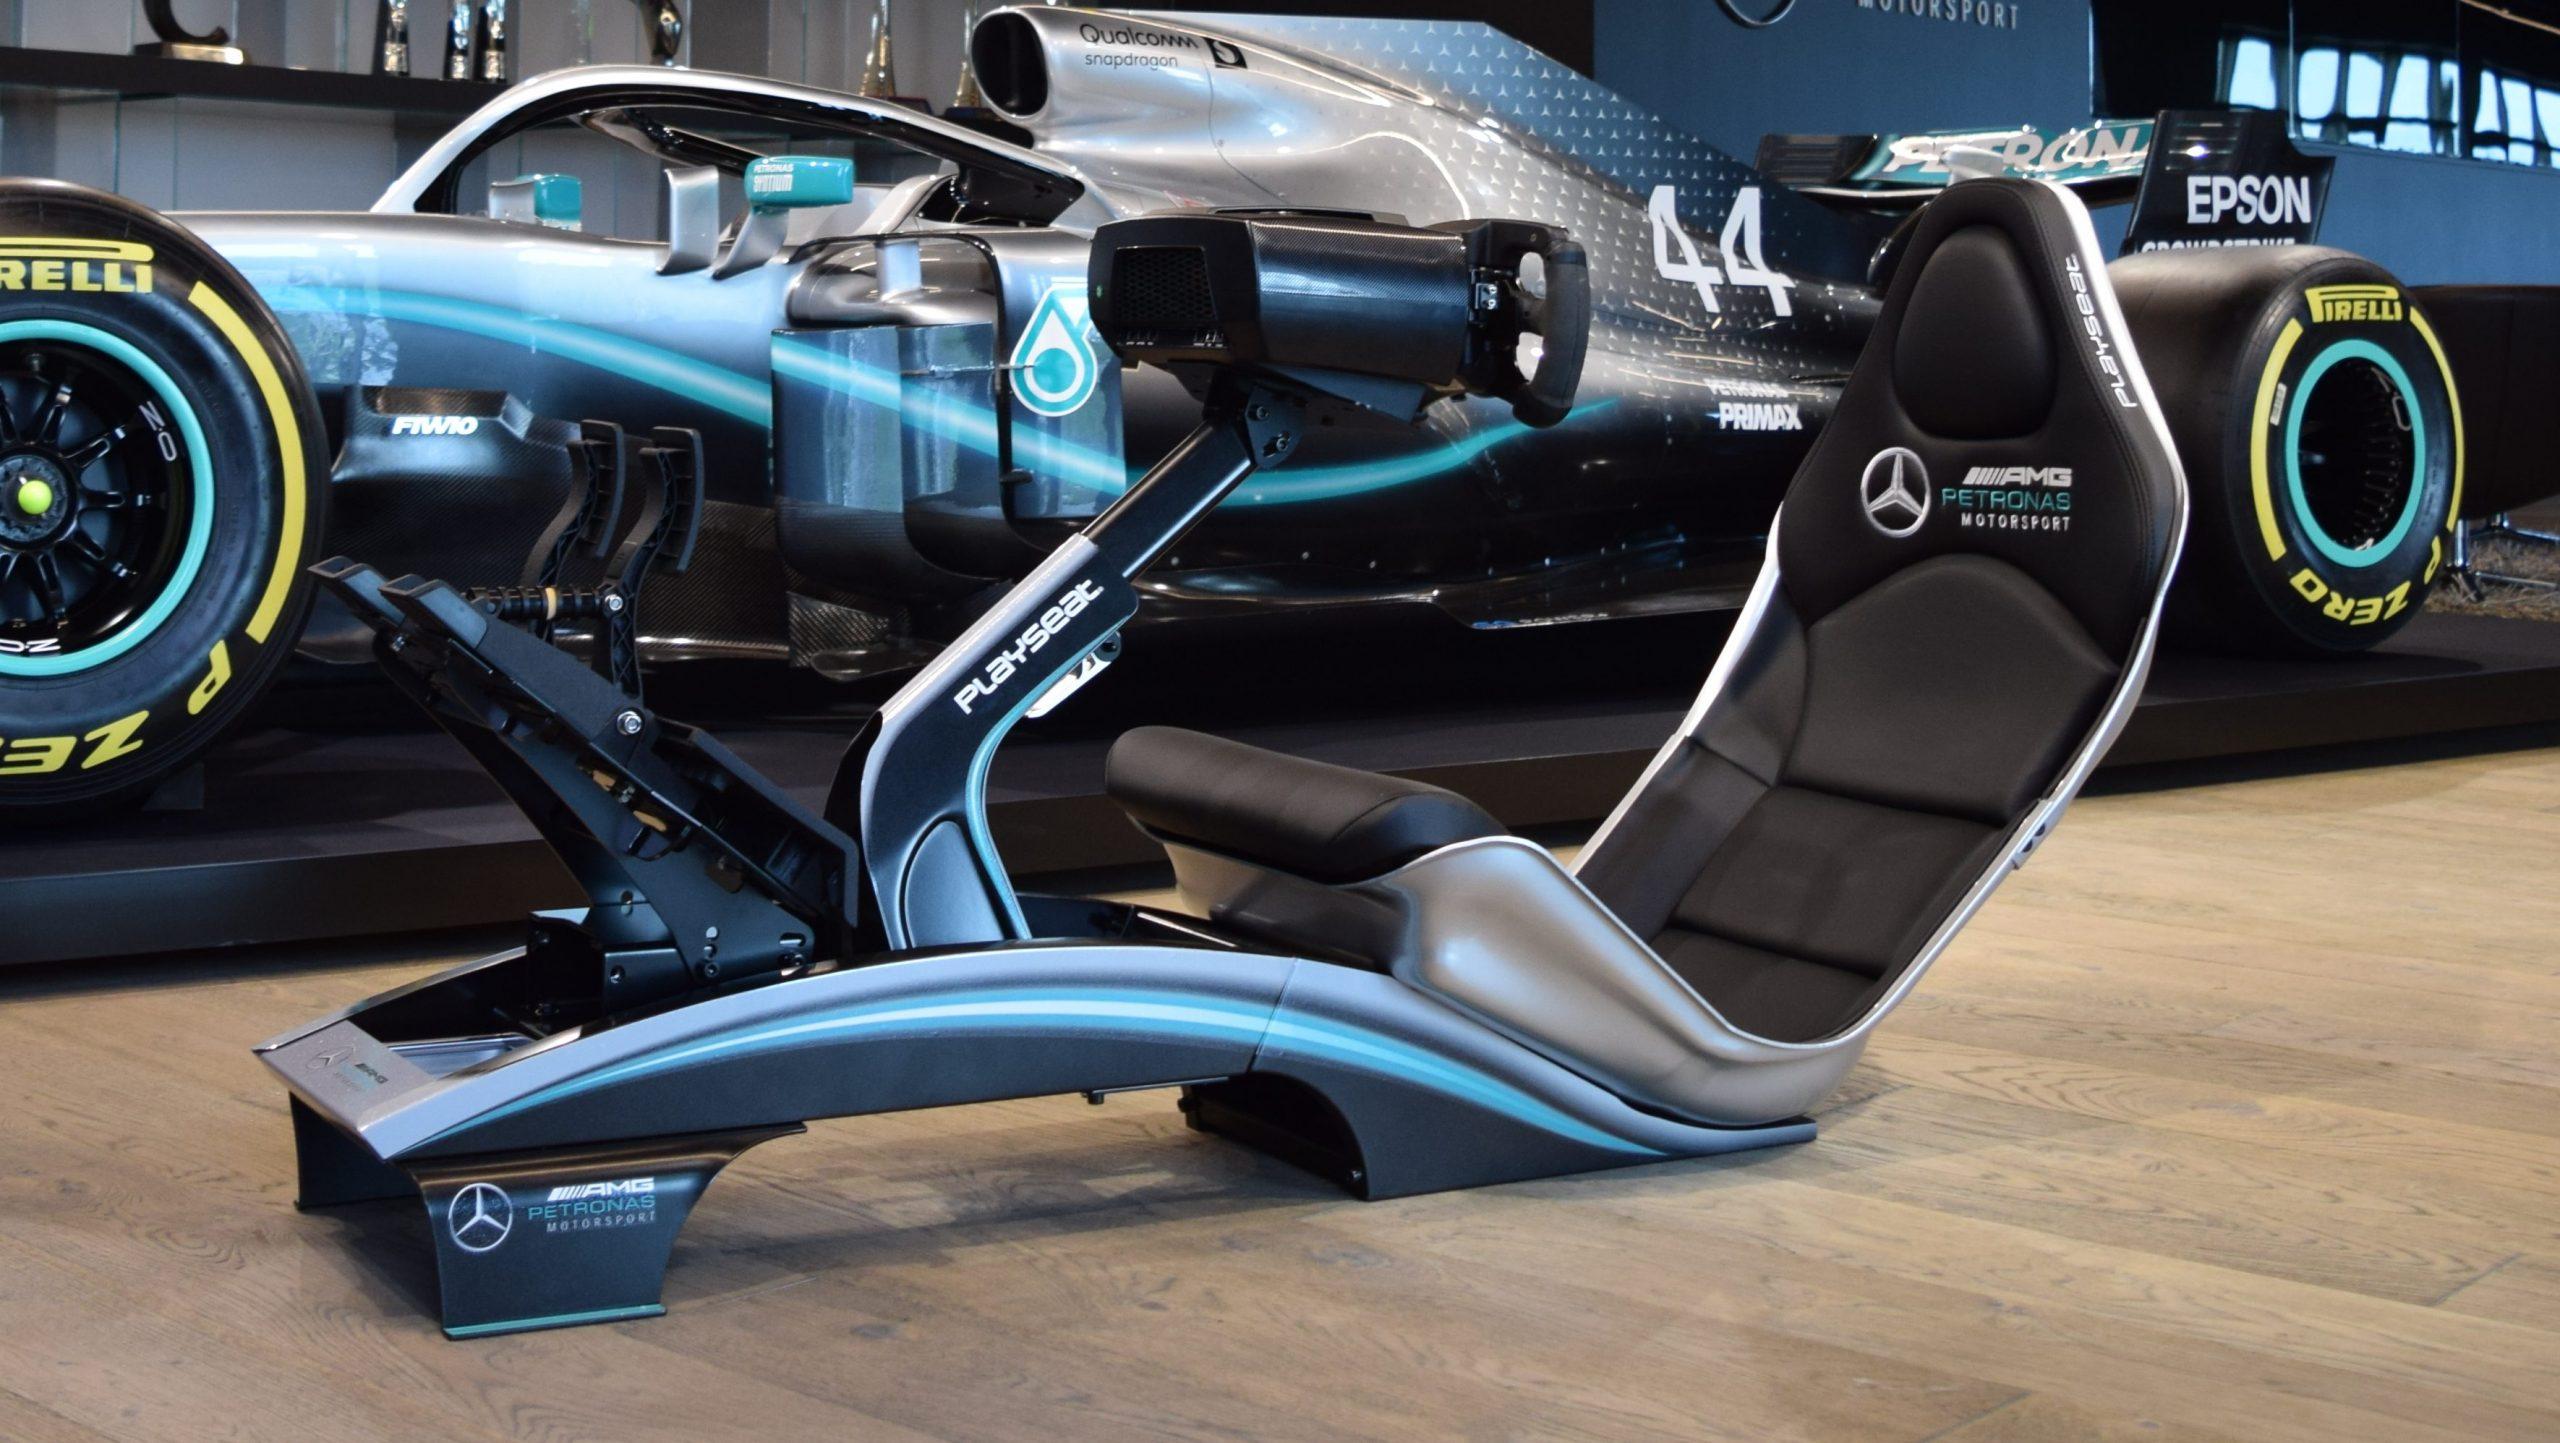 De Playseat Mercedes F1 ontbrak nog in je mancave TopGear